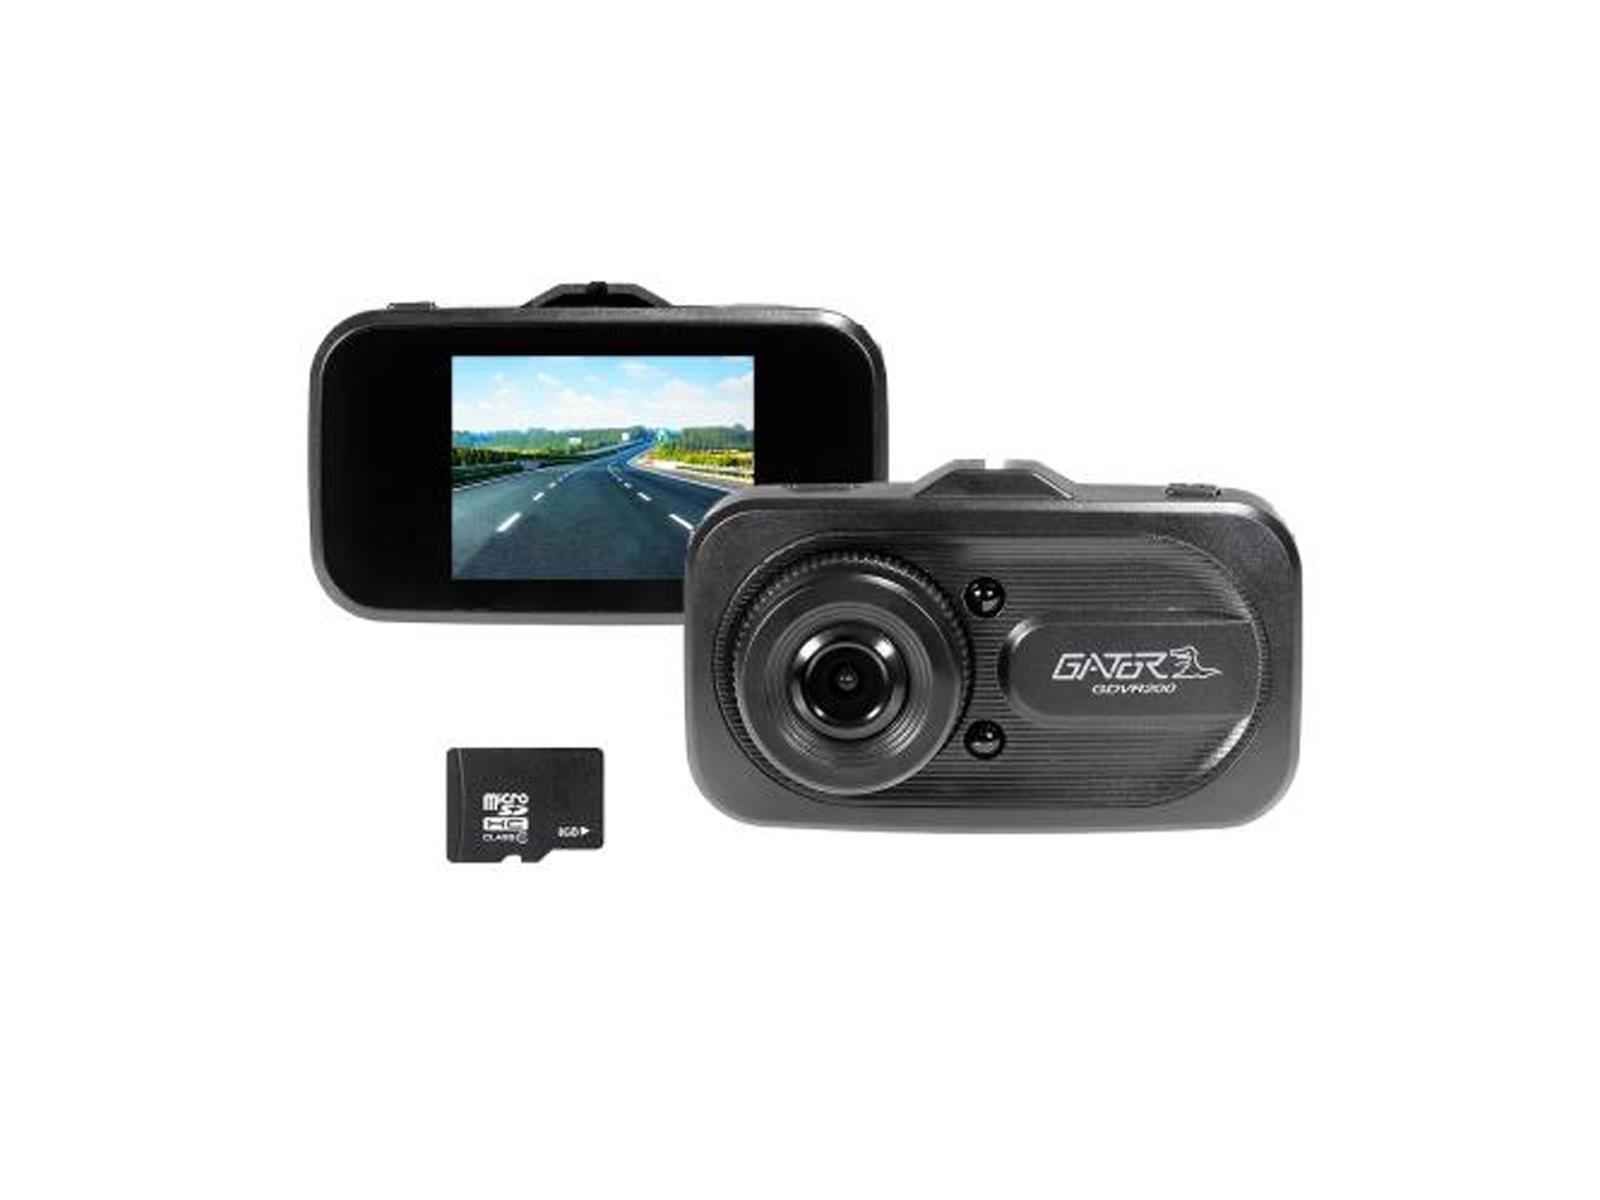 Gator dashcam 720 HD + Display + 8GB Micro SD